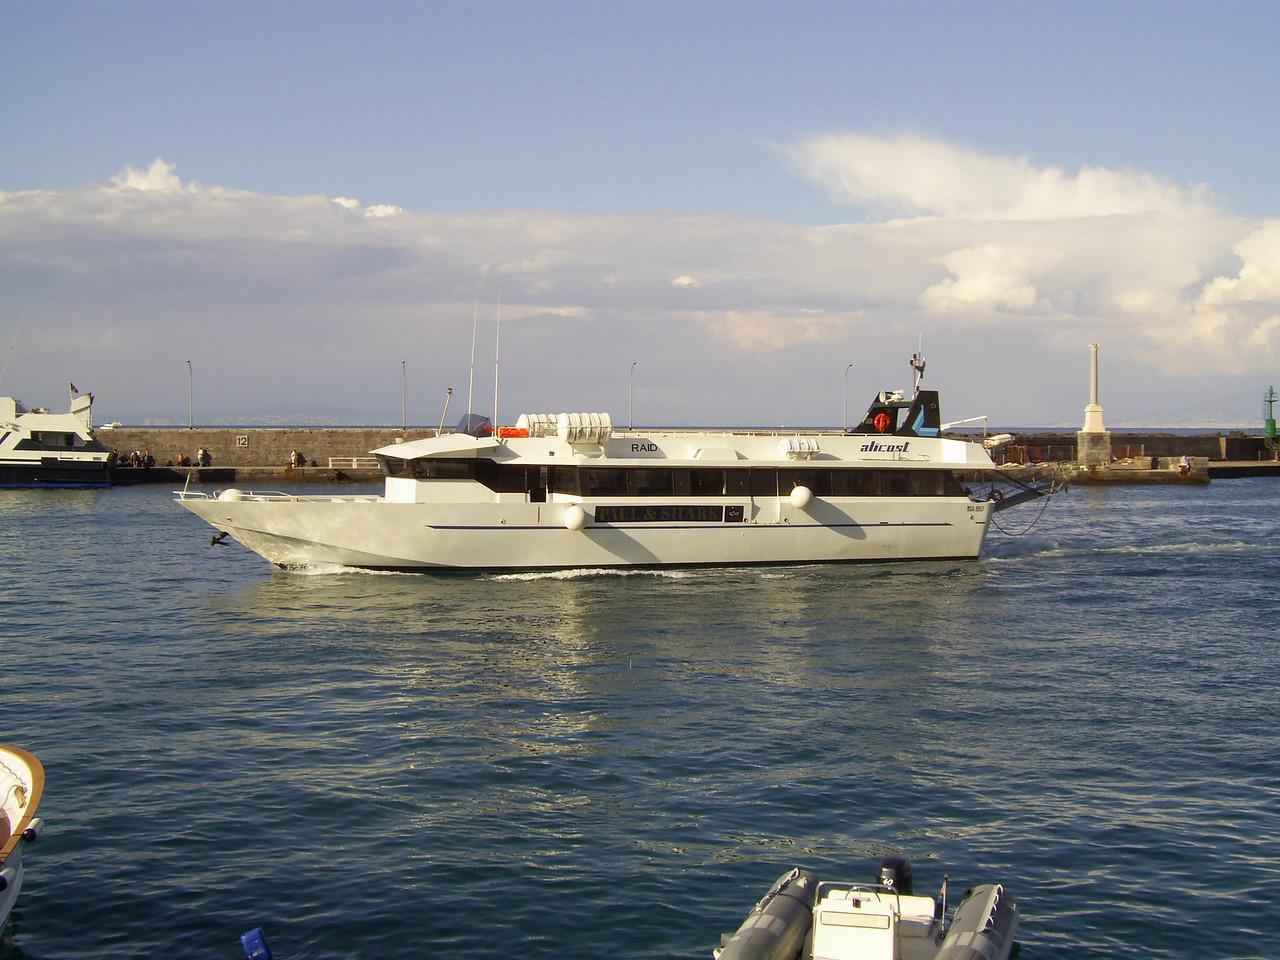 RAID arriving to Capri from Ischia.